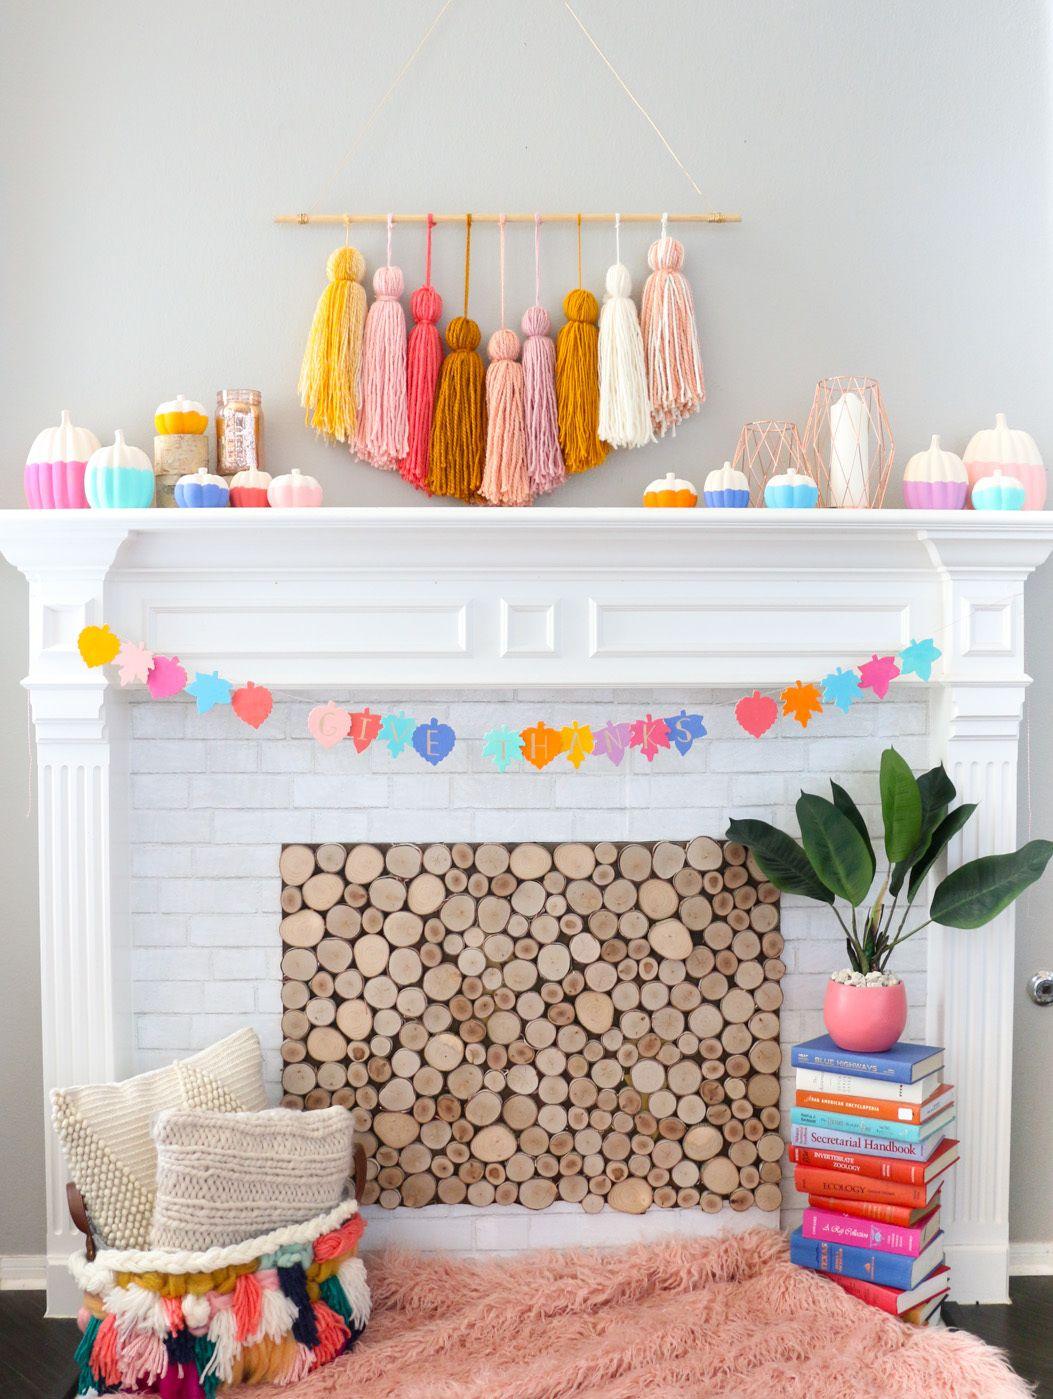 99 Home Decor Craft Ideas Decor Crafts Crafts Decorating Your Home